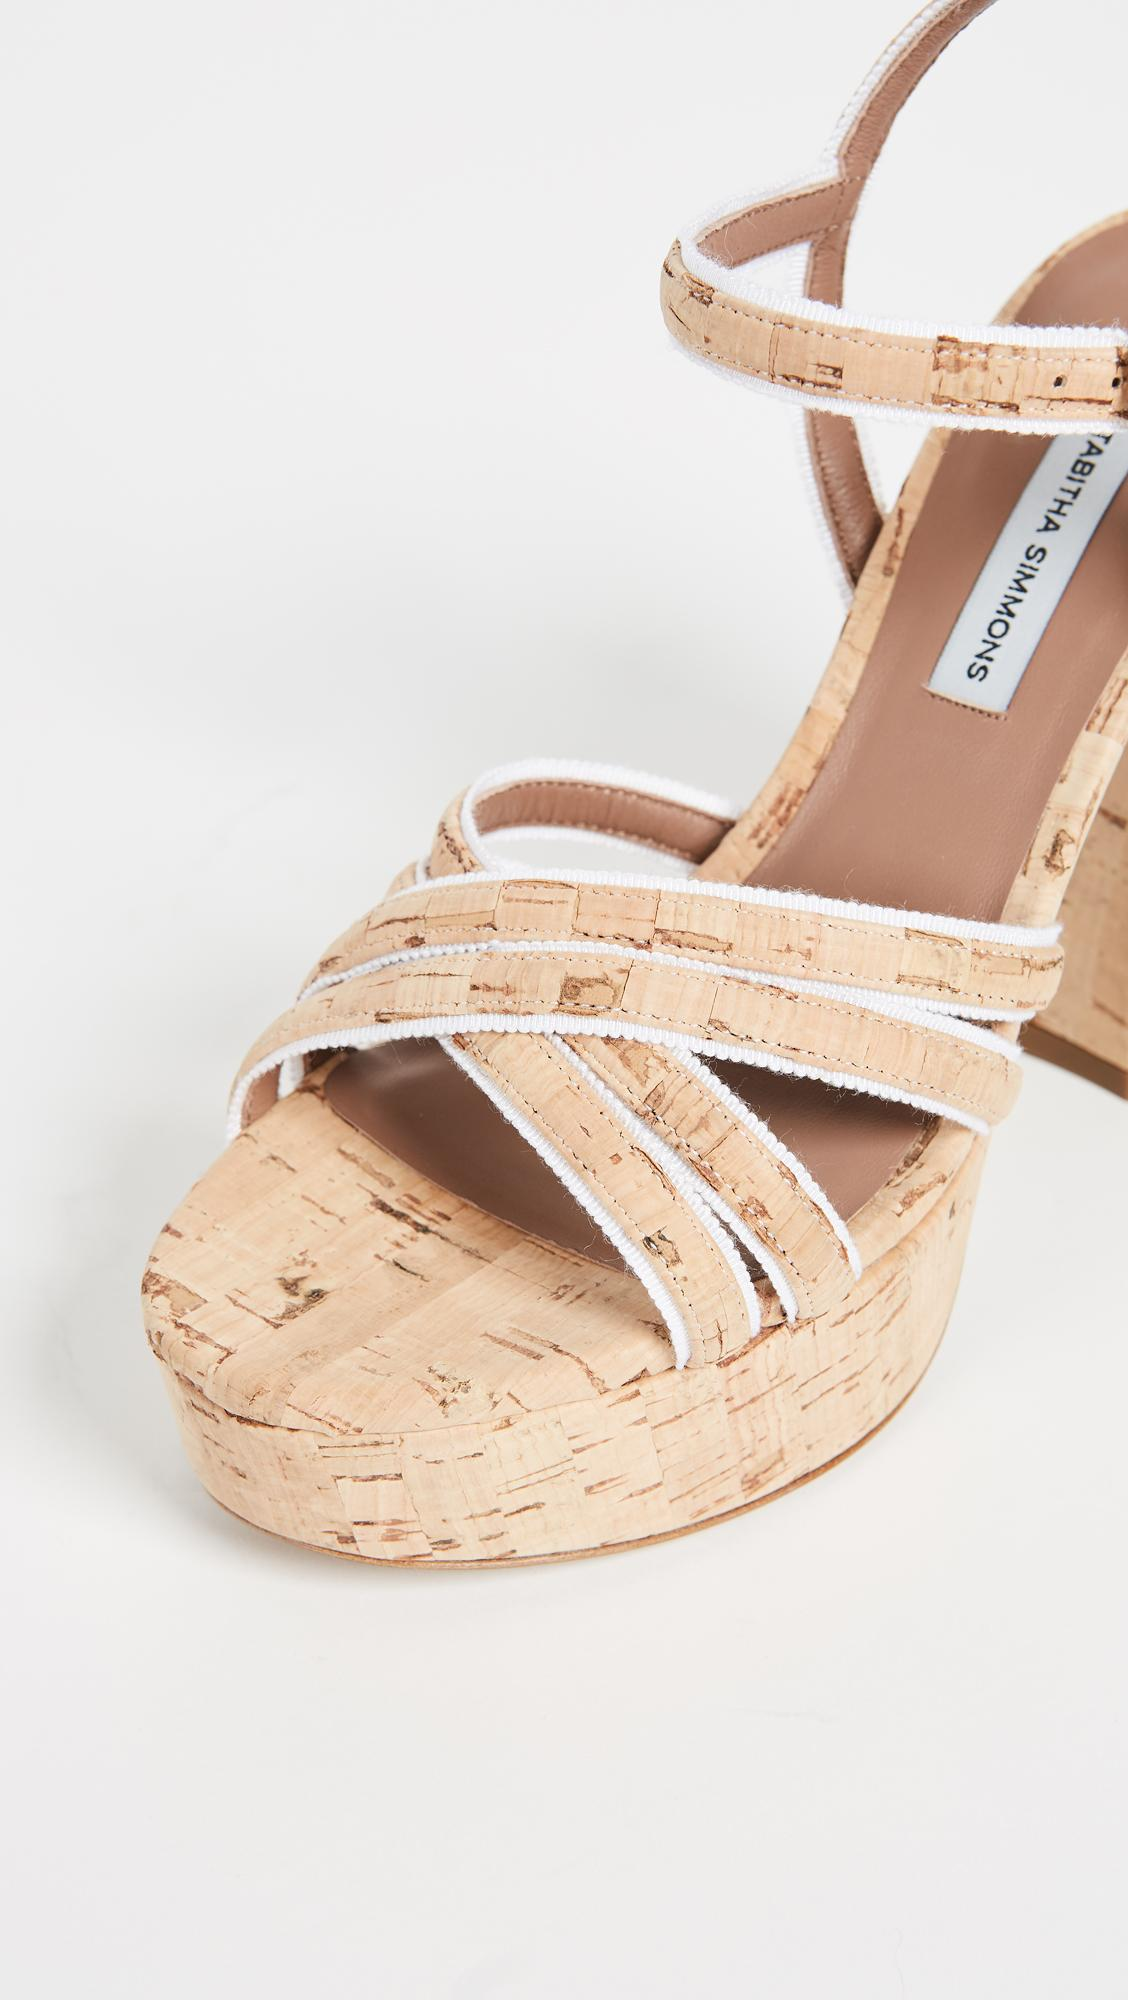 Tabitha Simmons Women's Hensley Cork Platform High-Heel Sandals In Natural/White